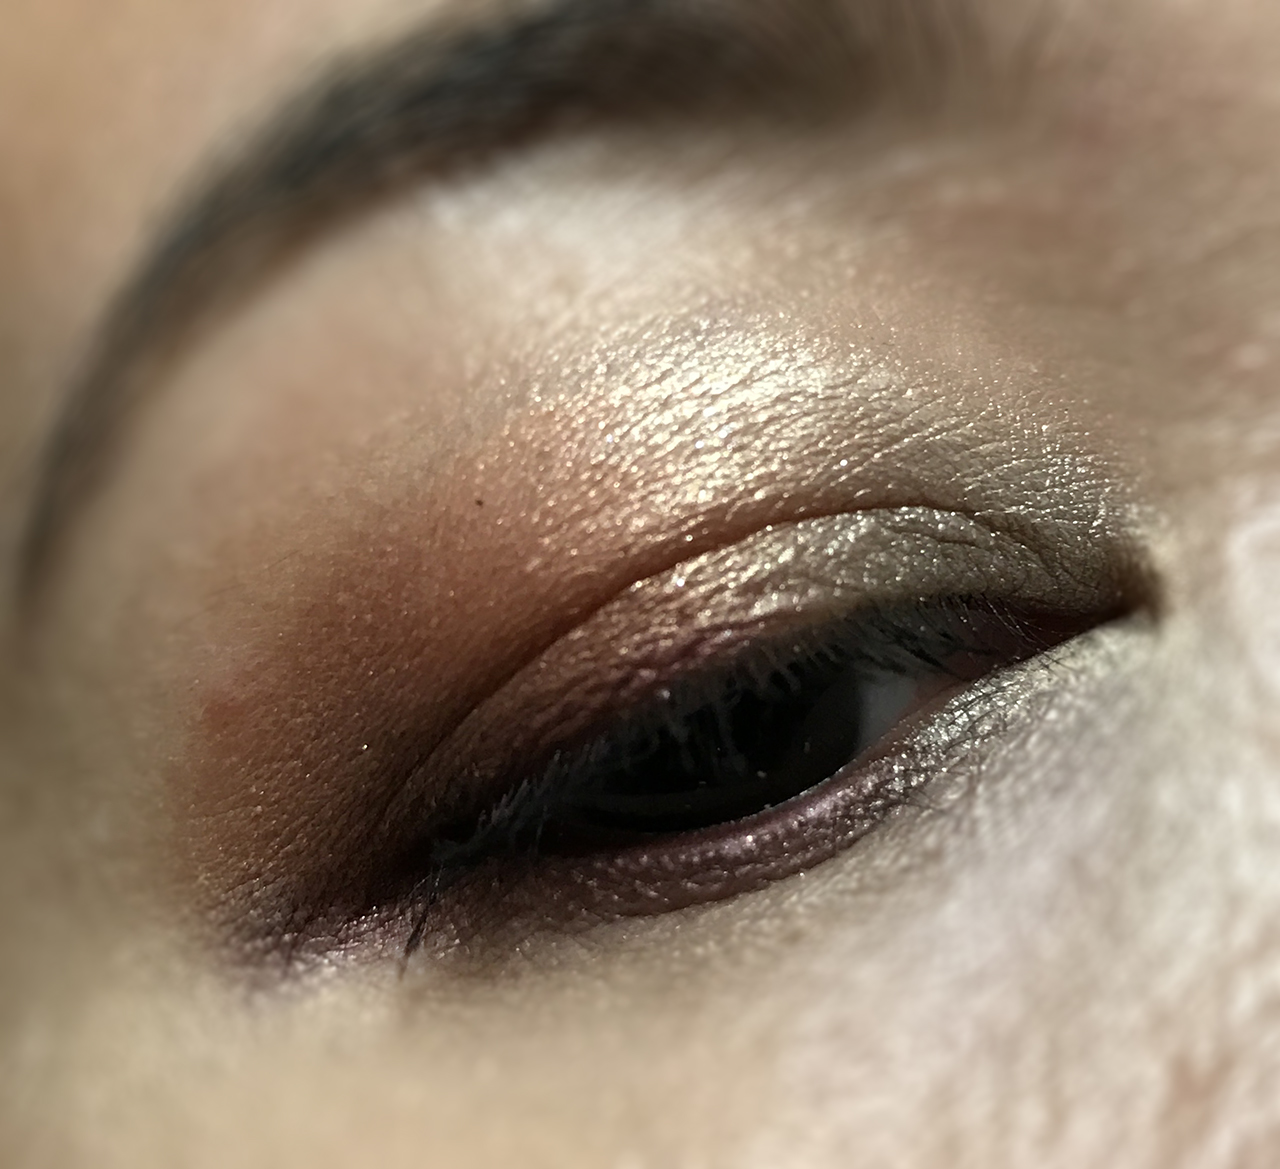 Shu Uemura Peach's Palette Adventurous Princess eye makeup look